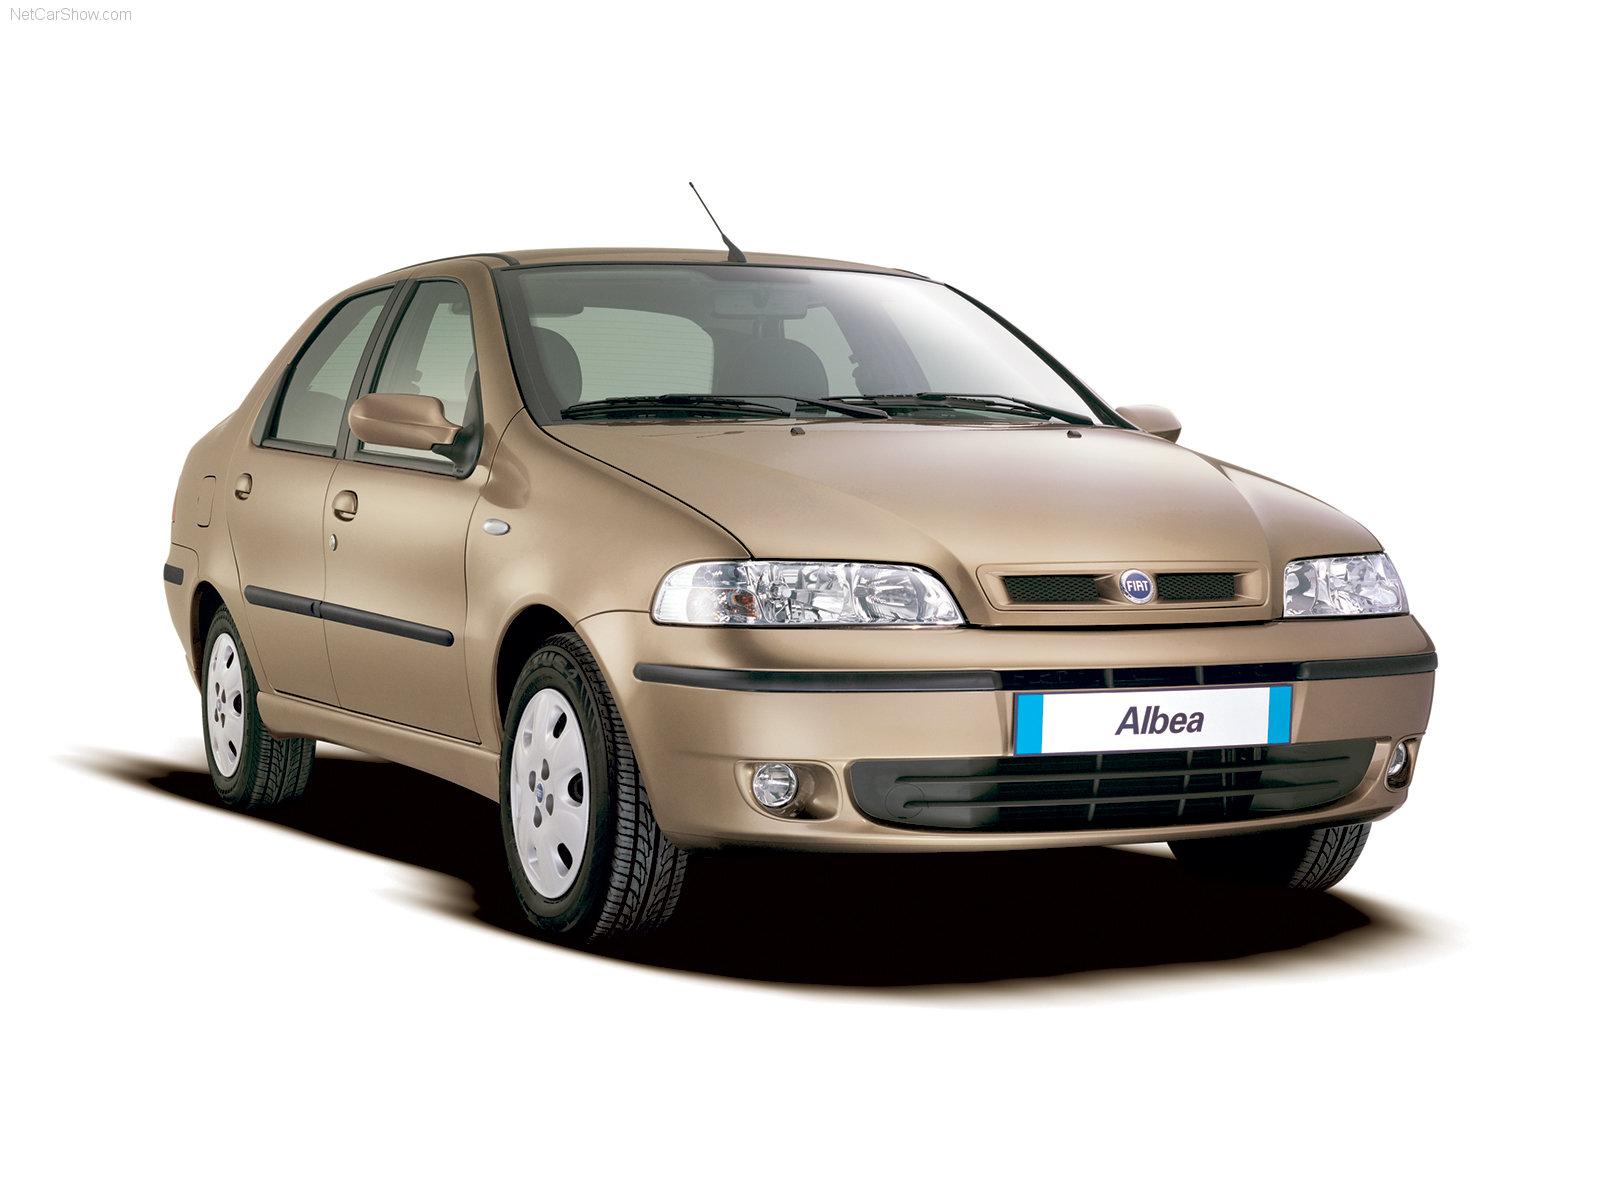 Fiat Albea Photos Photogallery With 6 Pics Carsbase Com